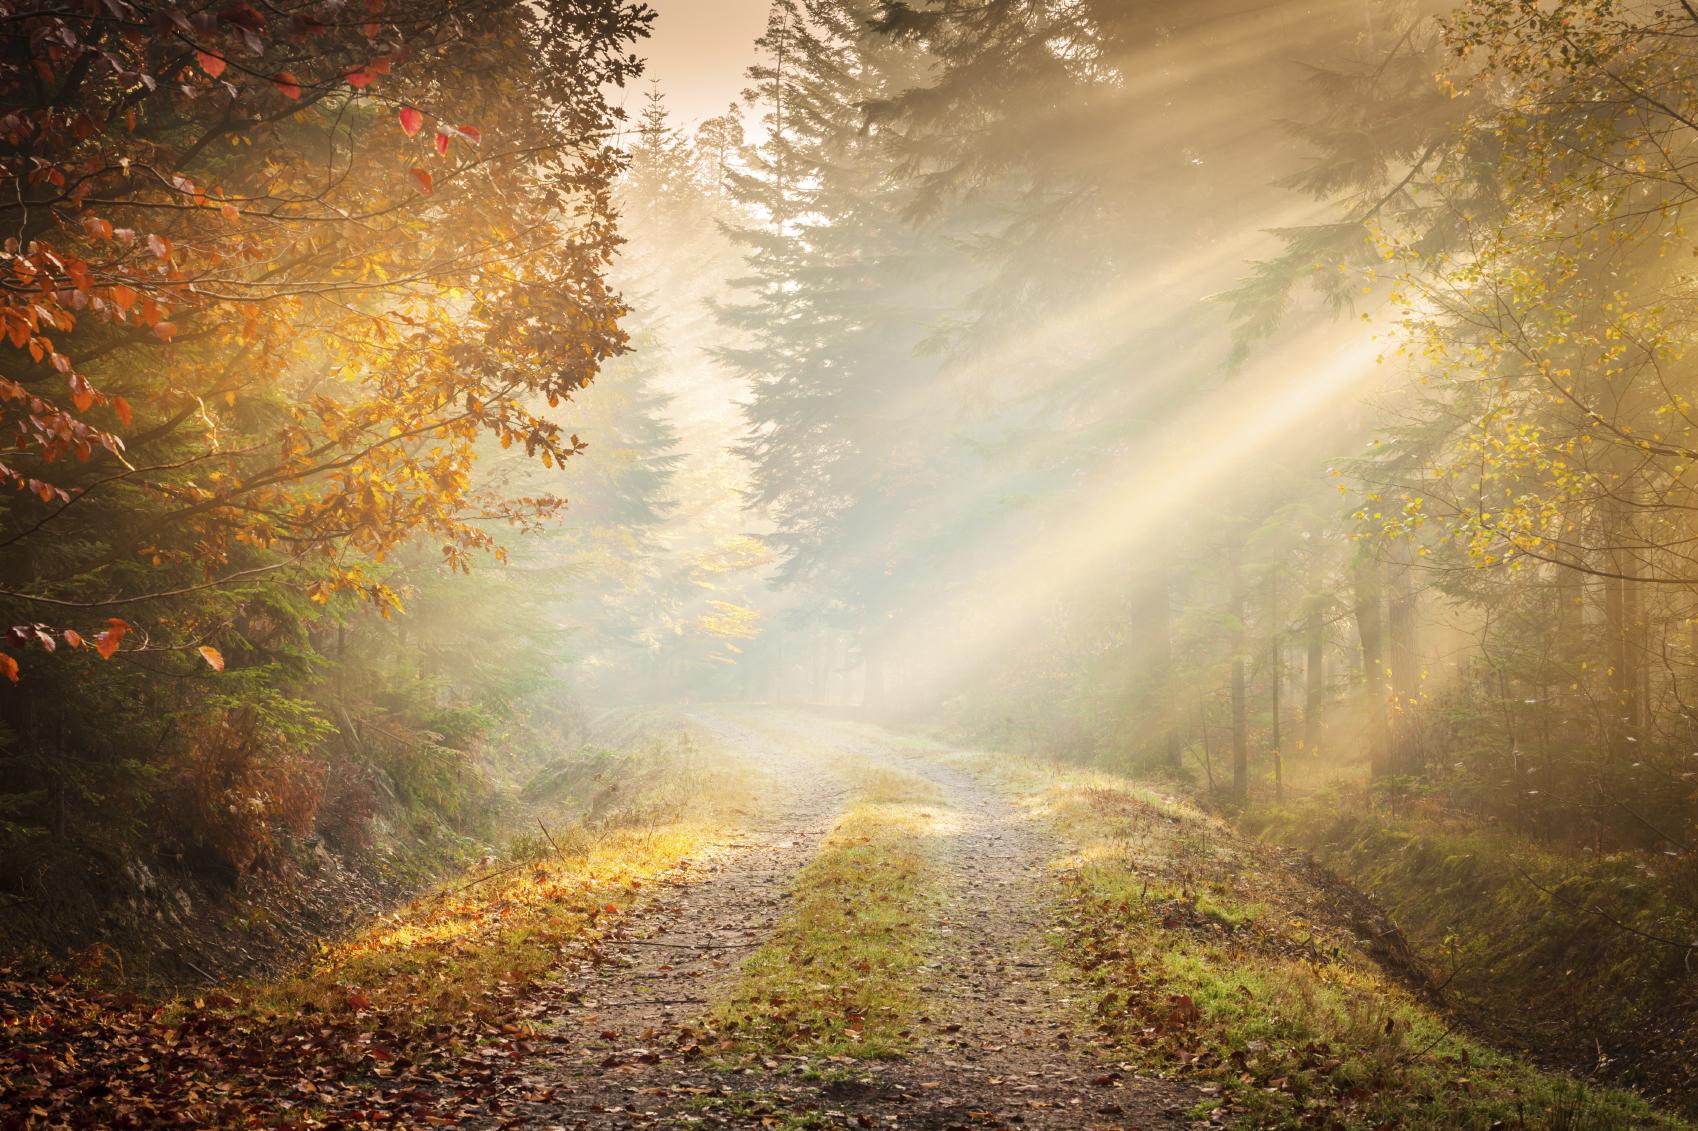 Autumn Fog - Fairytale Road winding through the Forest